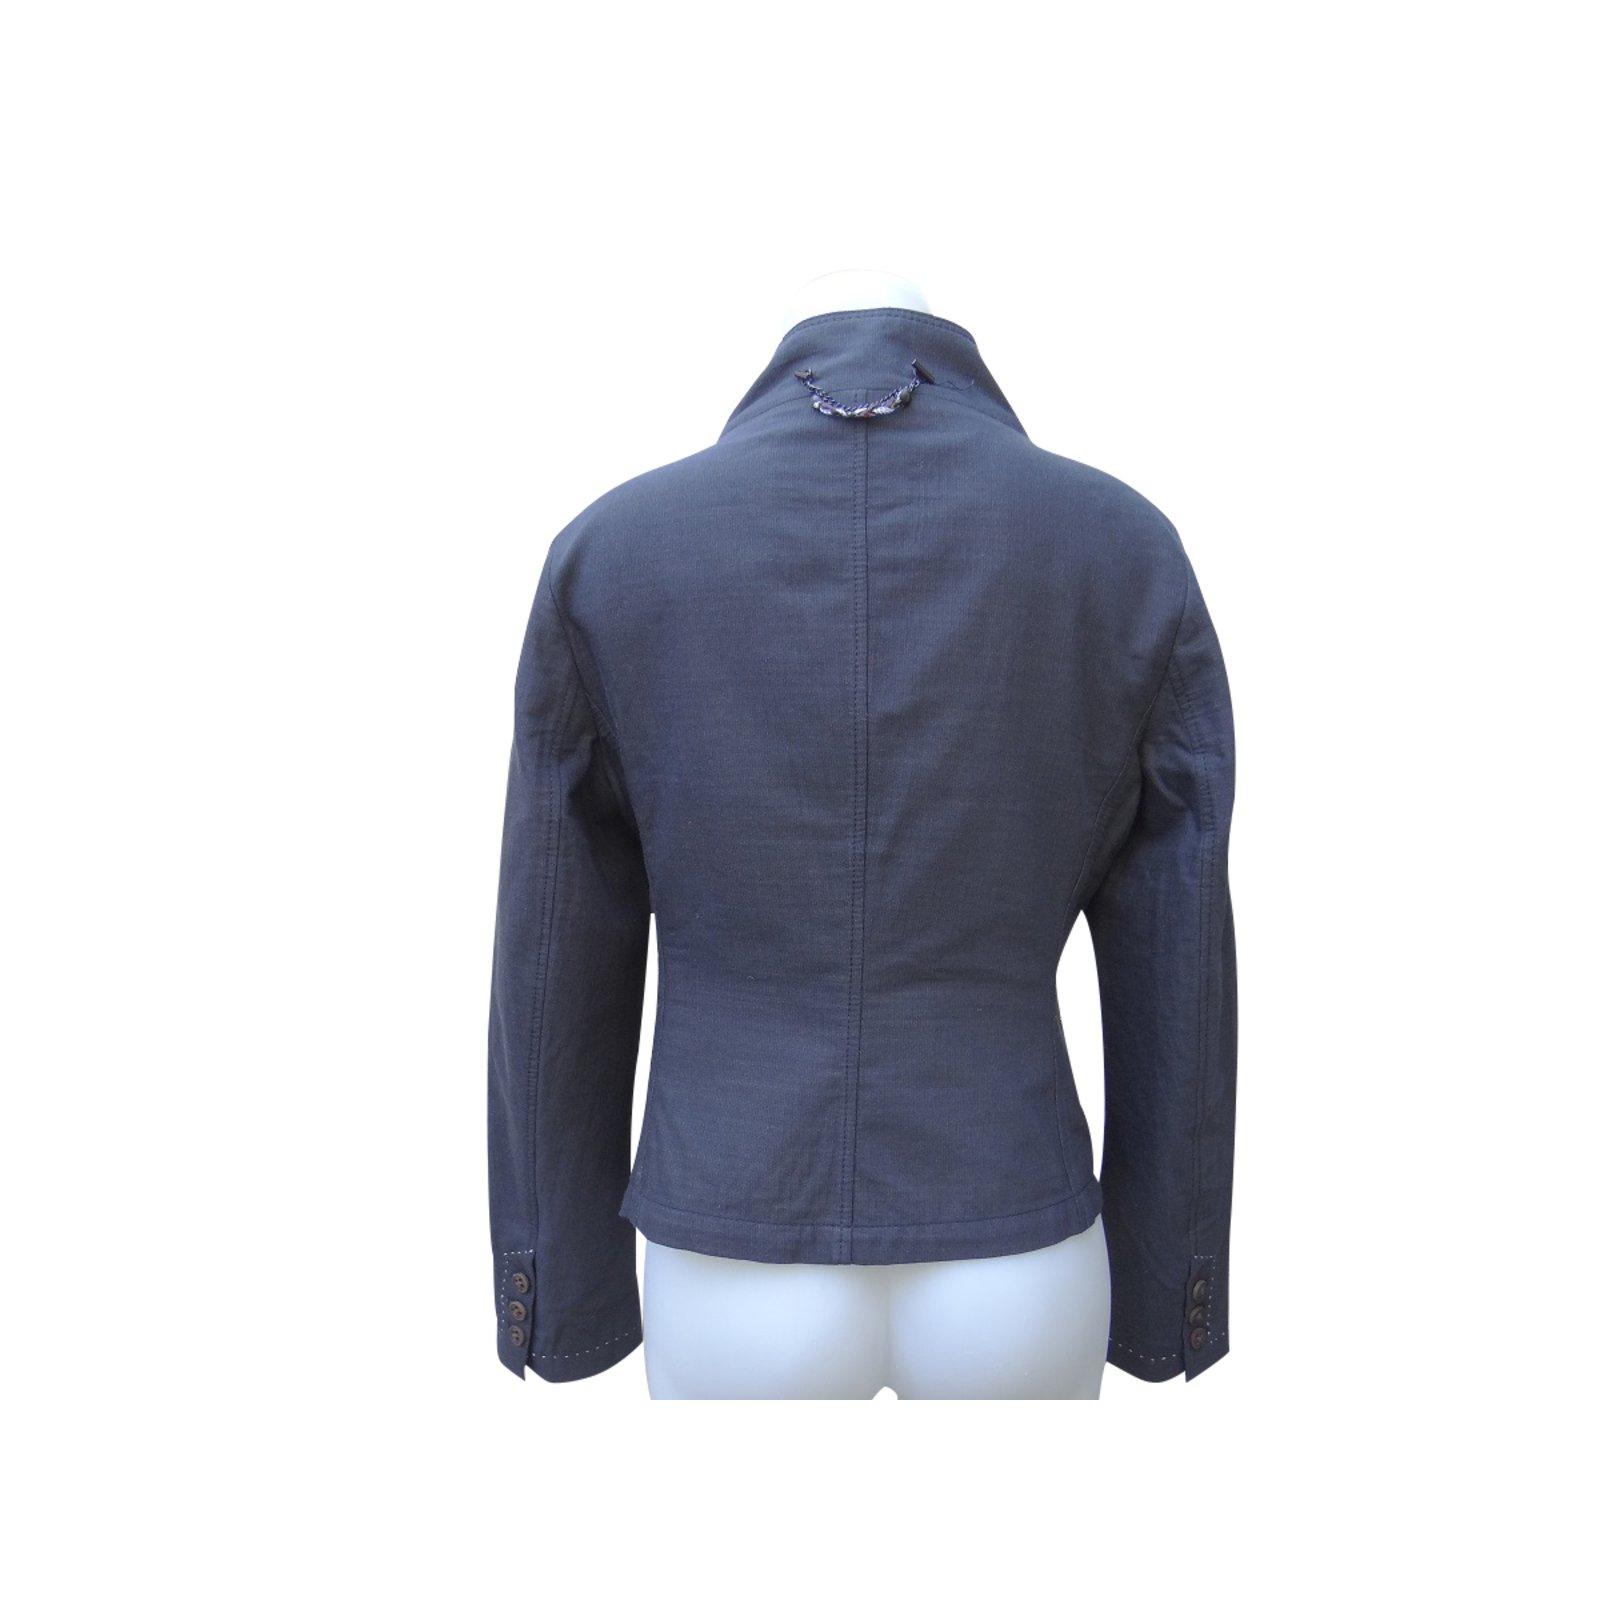 79415a55d Hugo Boss Jackets Jackets Cotton Grey ref.99911 - Joli Closet